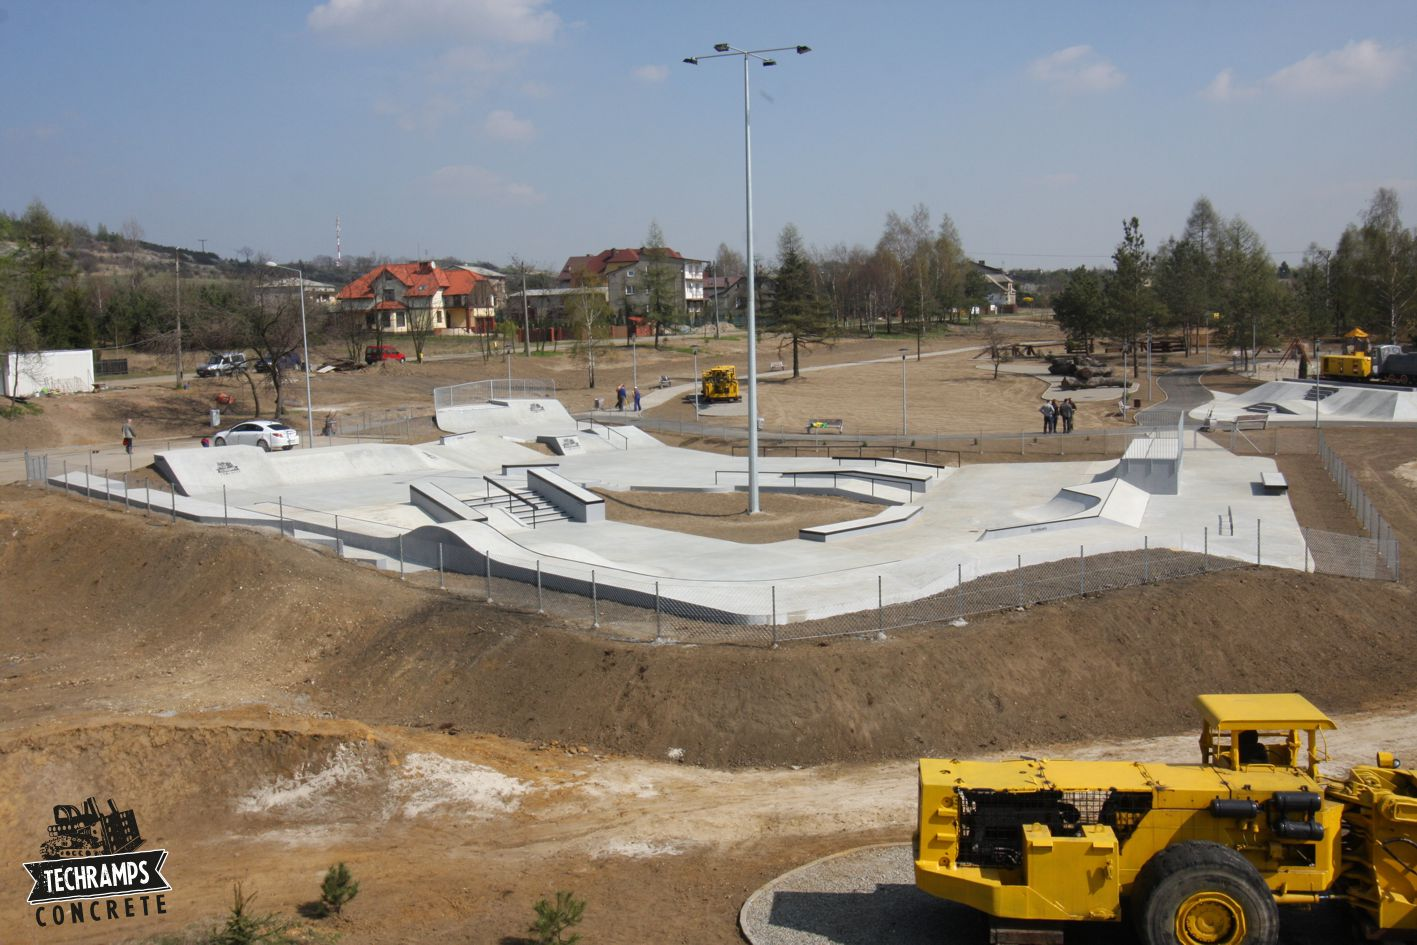 Realizacja skateparku Techramps